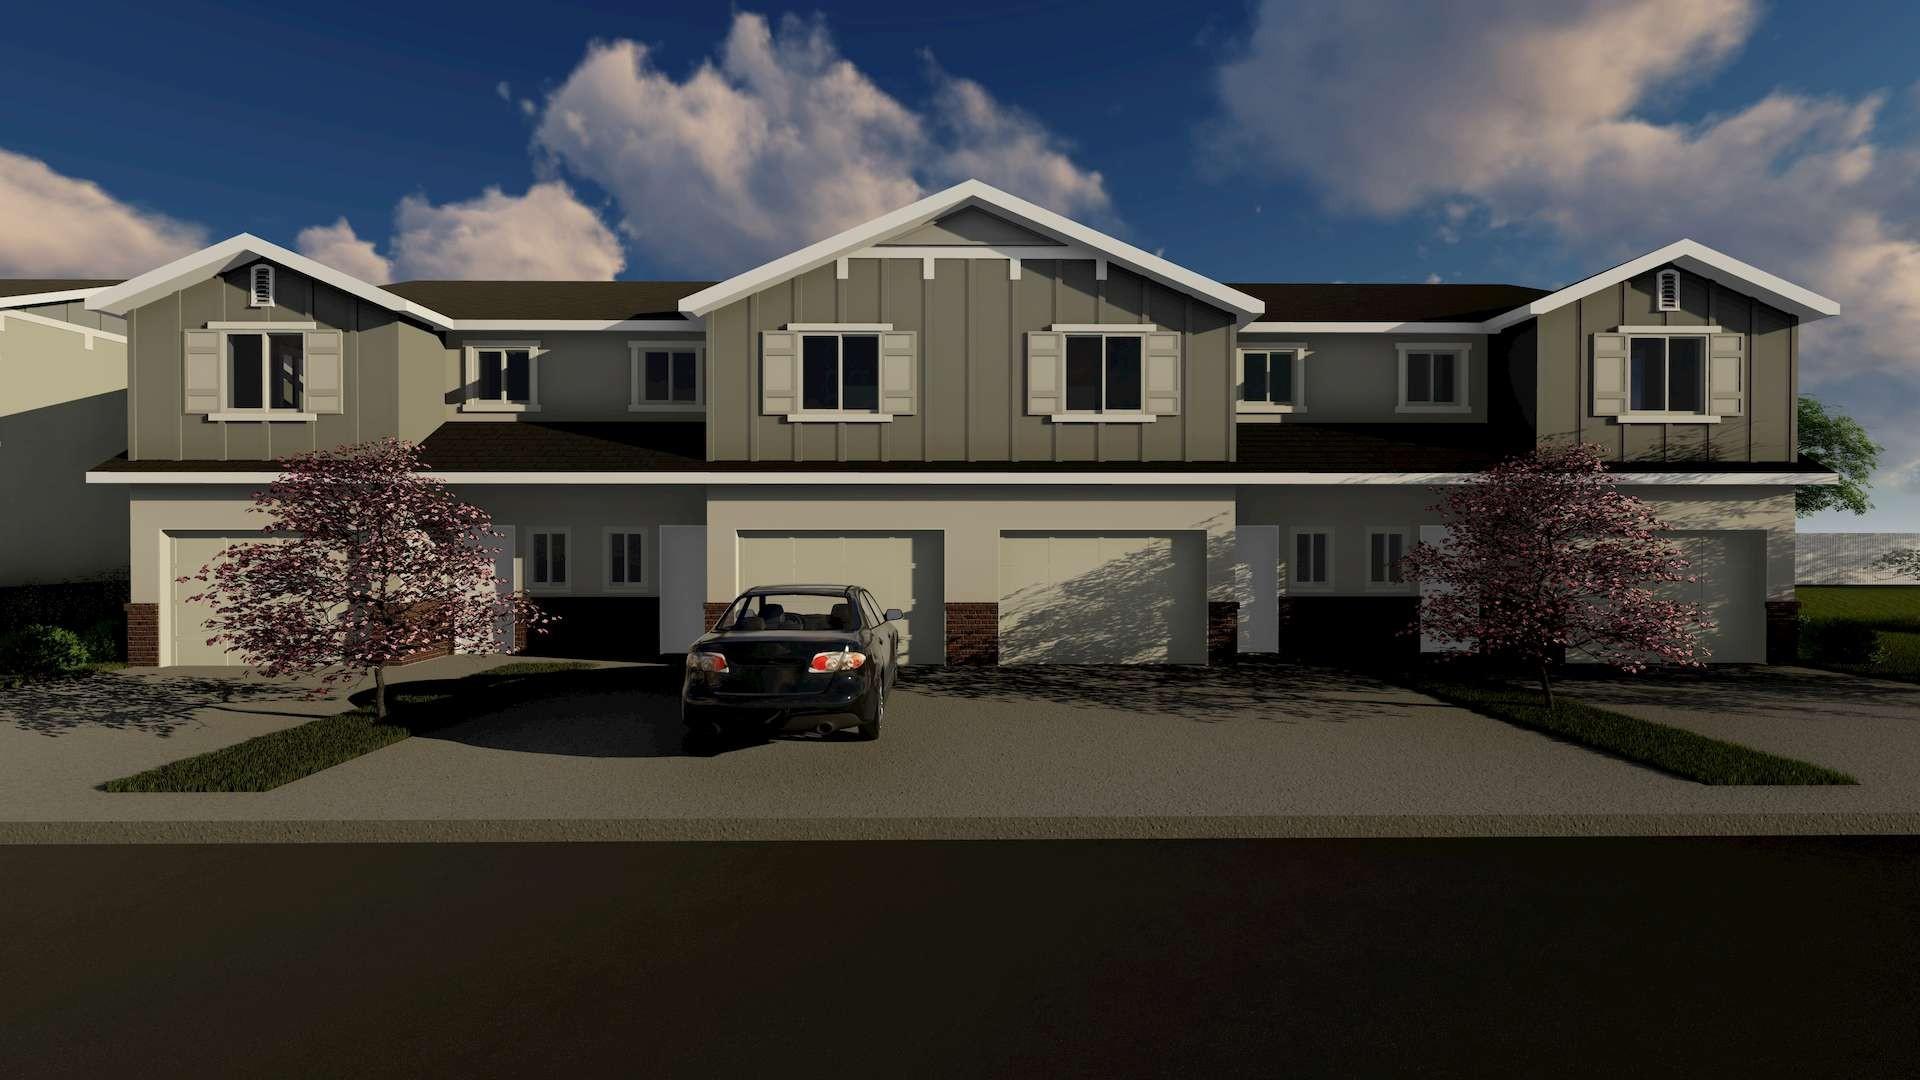 Boise real estate investment, entrata farms